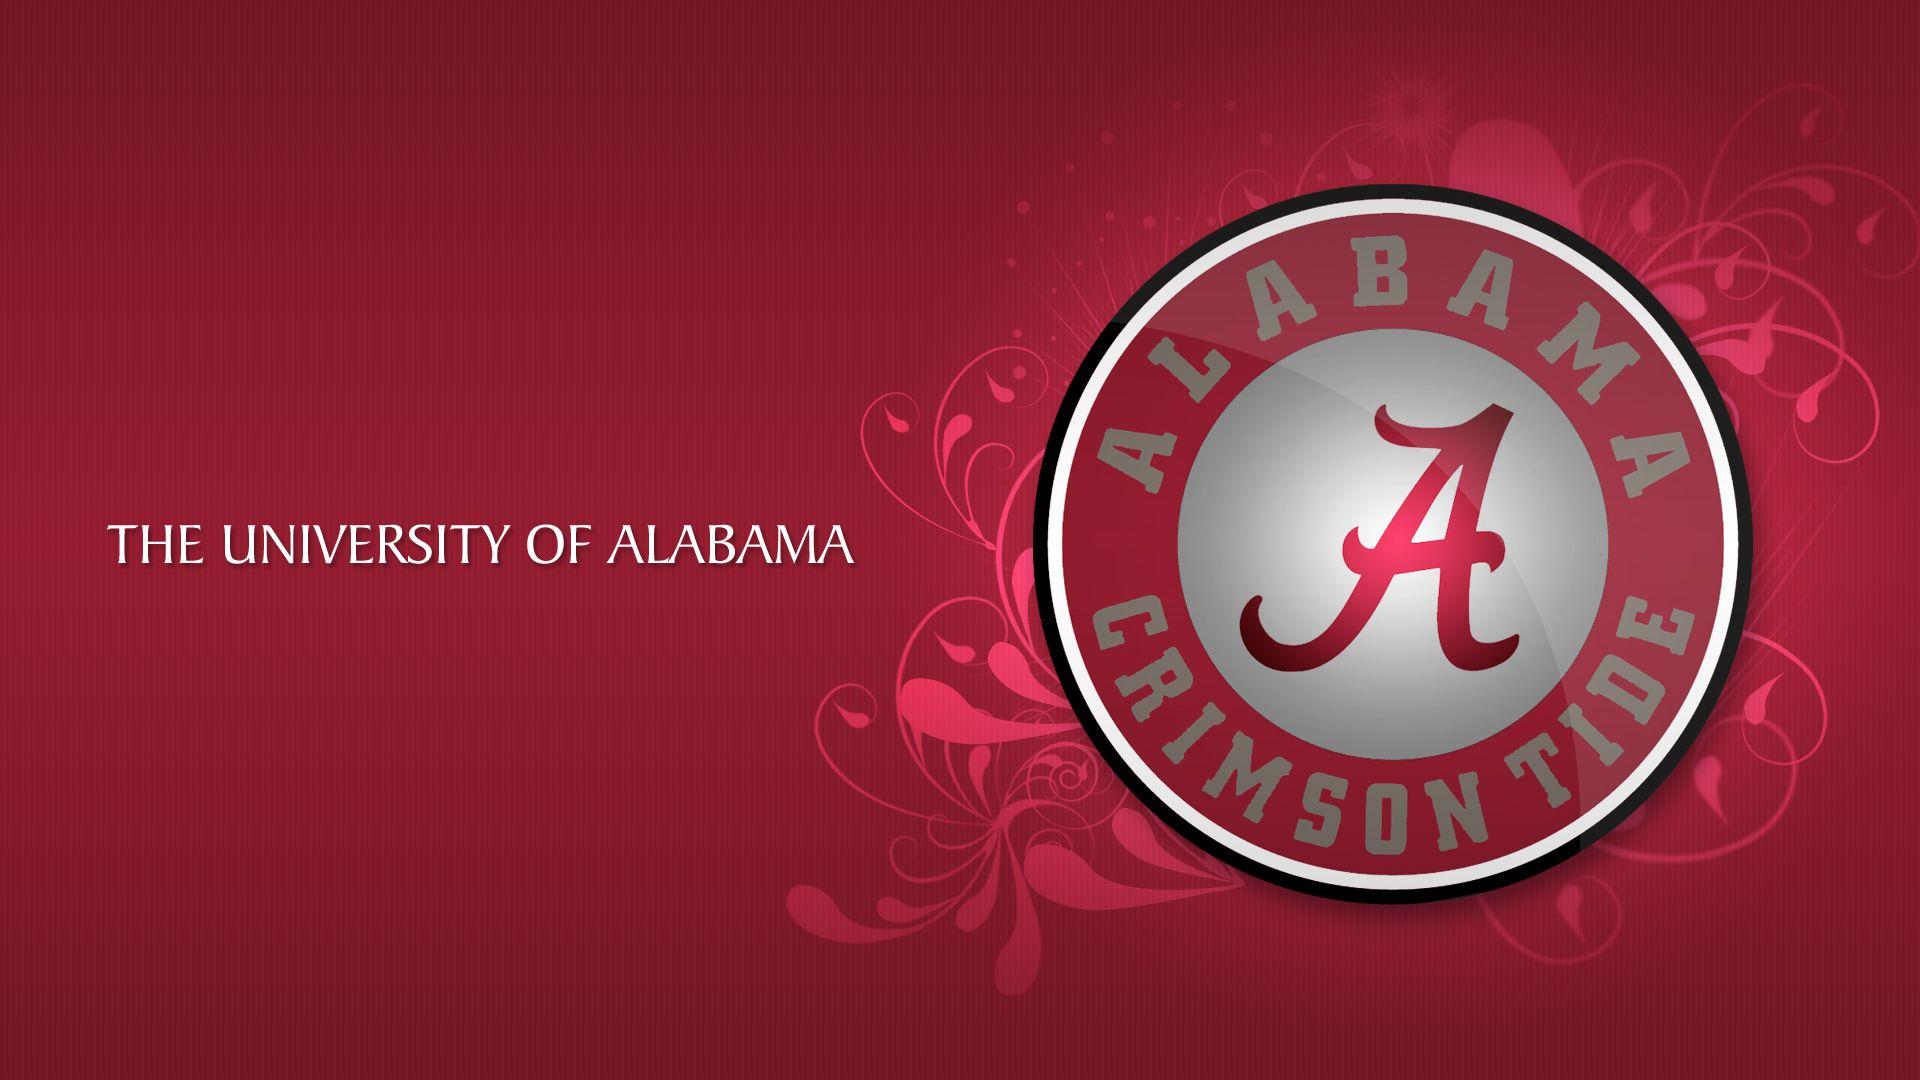 Roll Tide Wallpaper Alabama Crimson Tide Football Wallpaper Alabama Crimson Tide Logo Alabama Crimson Tide